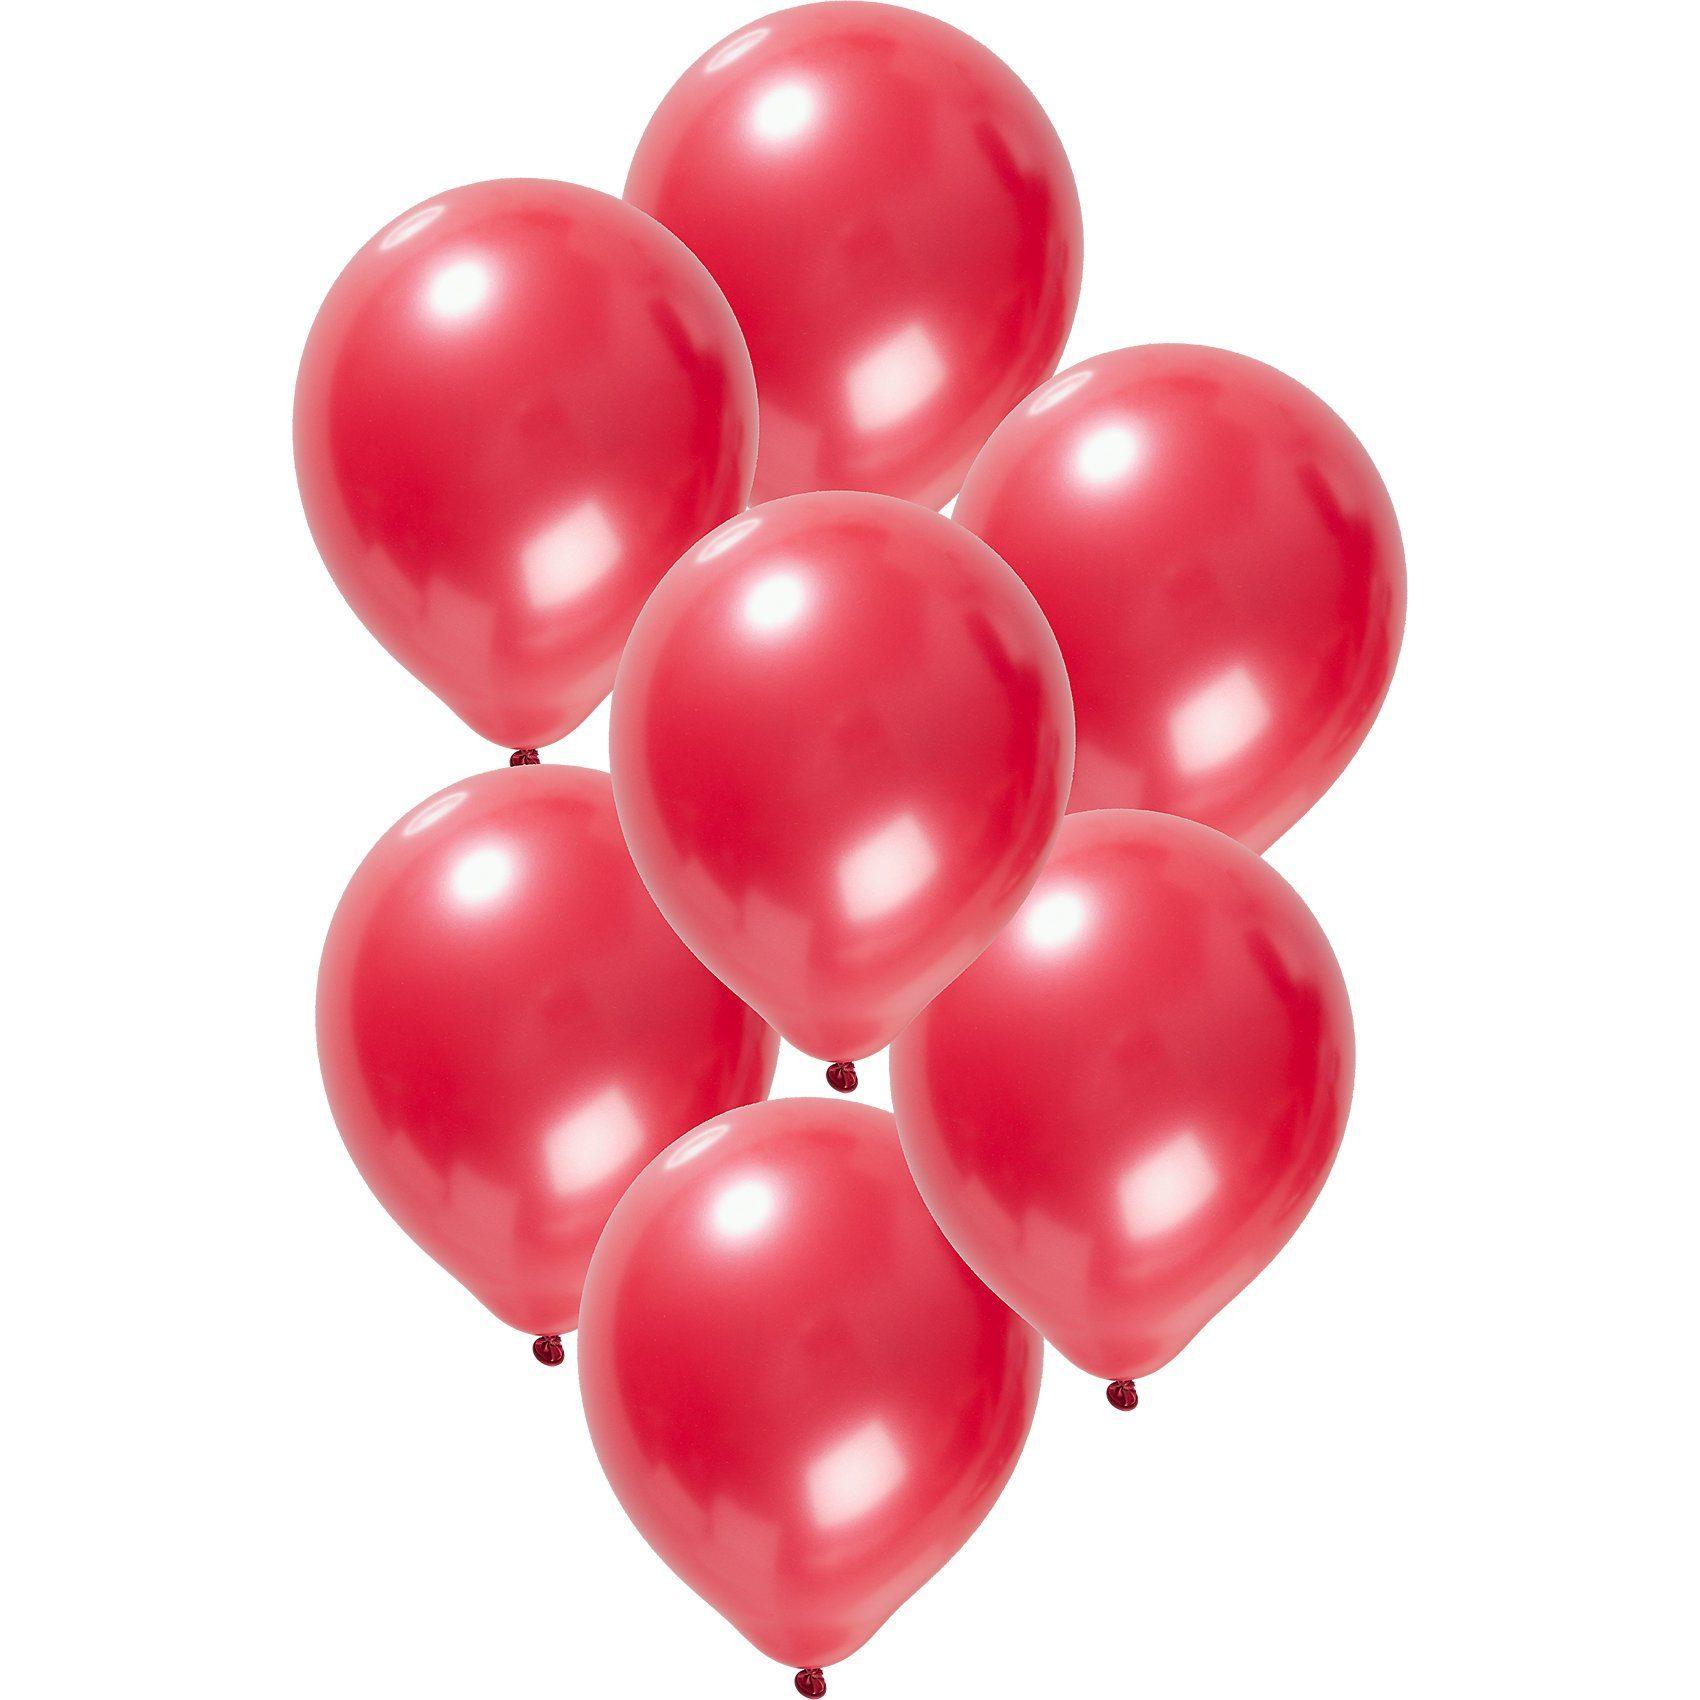 Luftballons metallic rot 30 cm, 50 Stück